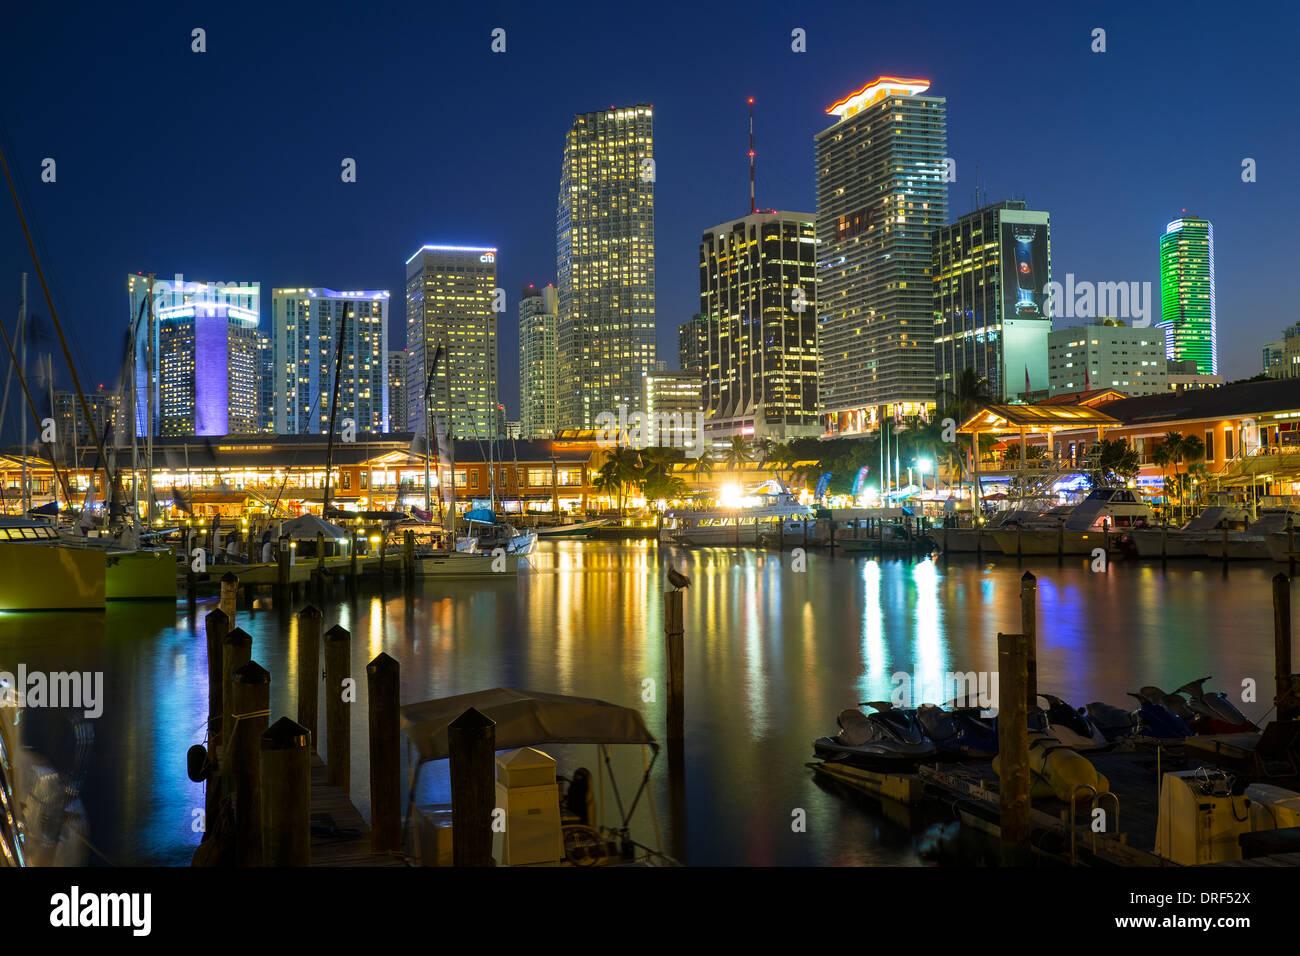 Miami Financial Skyline, Florida, USA - Stock Image